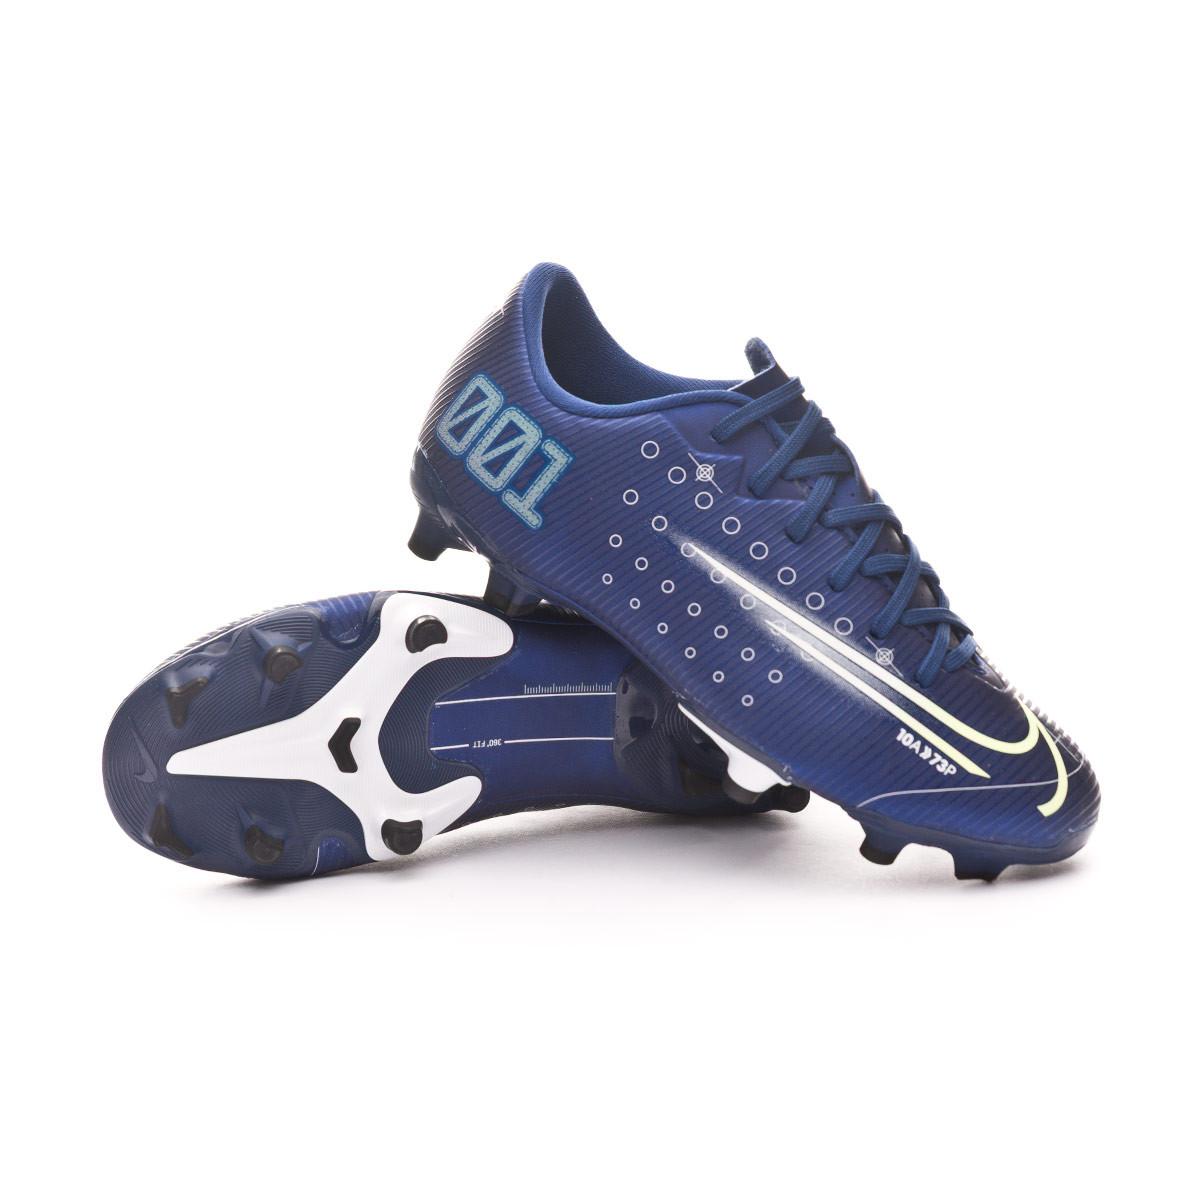 Scarpe Nike Mercurial Vapor XIII Academy MDS FGMG Bambino